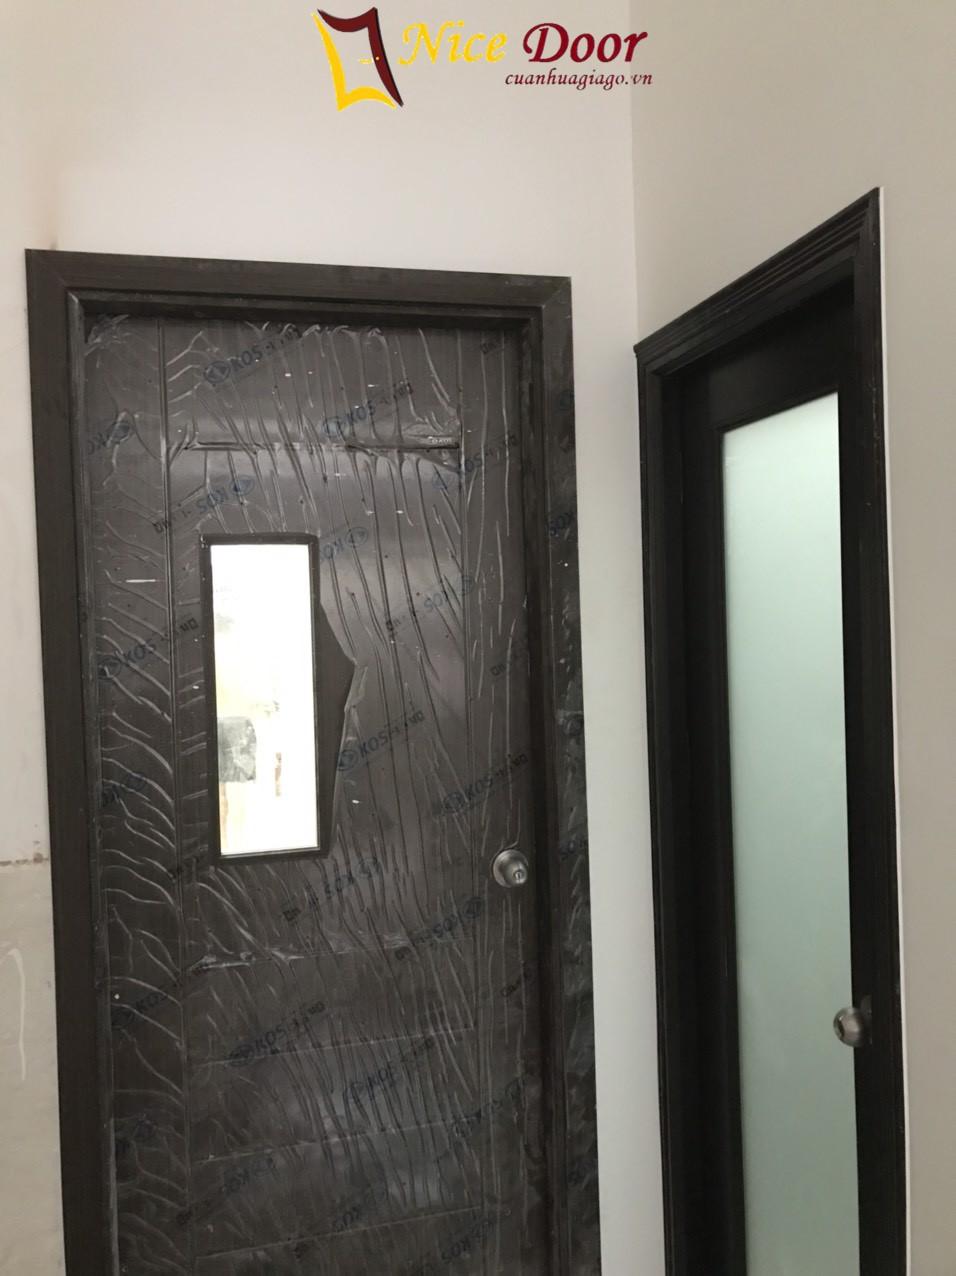 cửa phòng abs hàn quốc